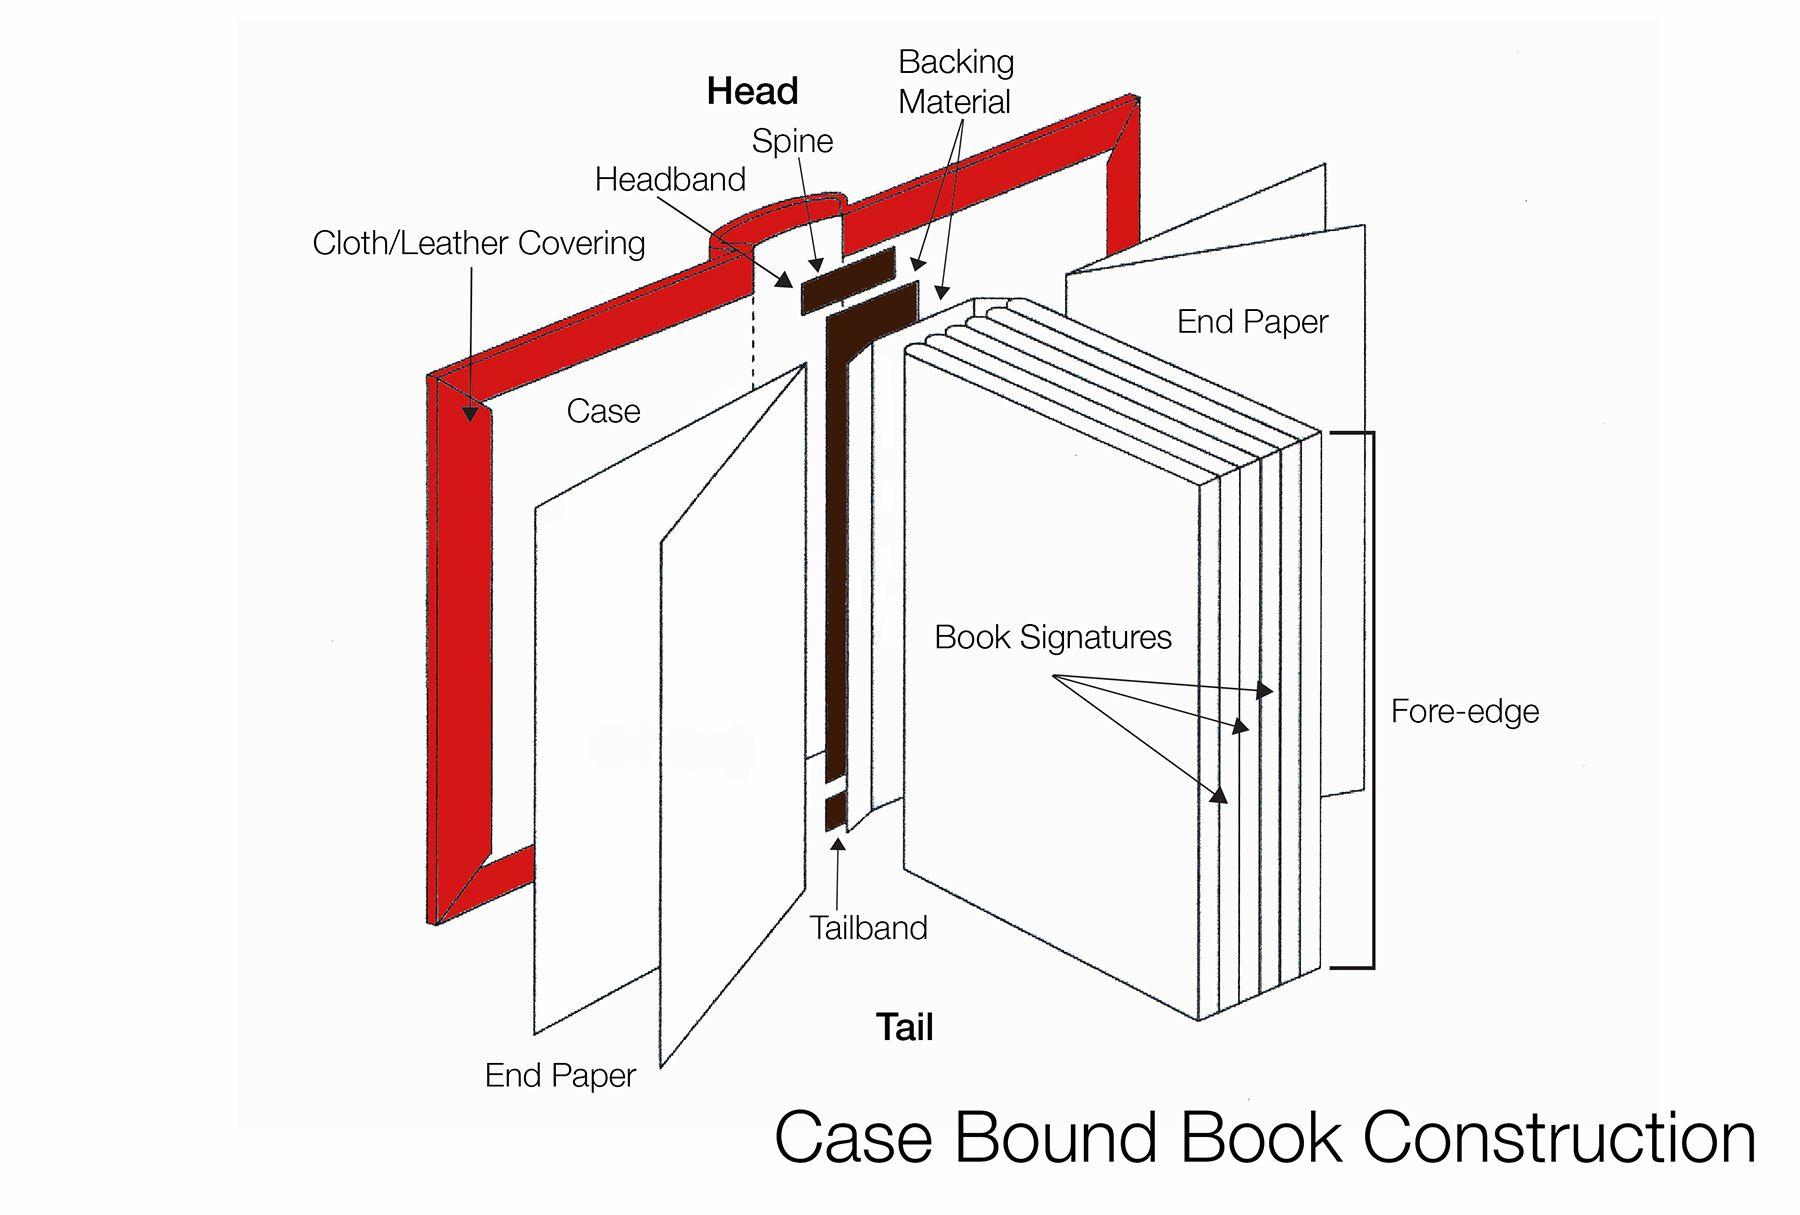 46d59284b7aedb7ca81fcc76b3f9432b casebinding diagram photobook pinterest diagram, online form book parts diagram at suagrazia.org